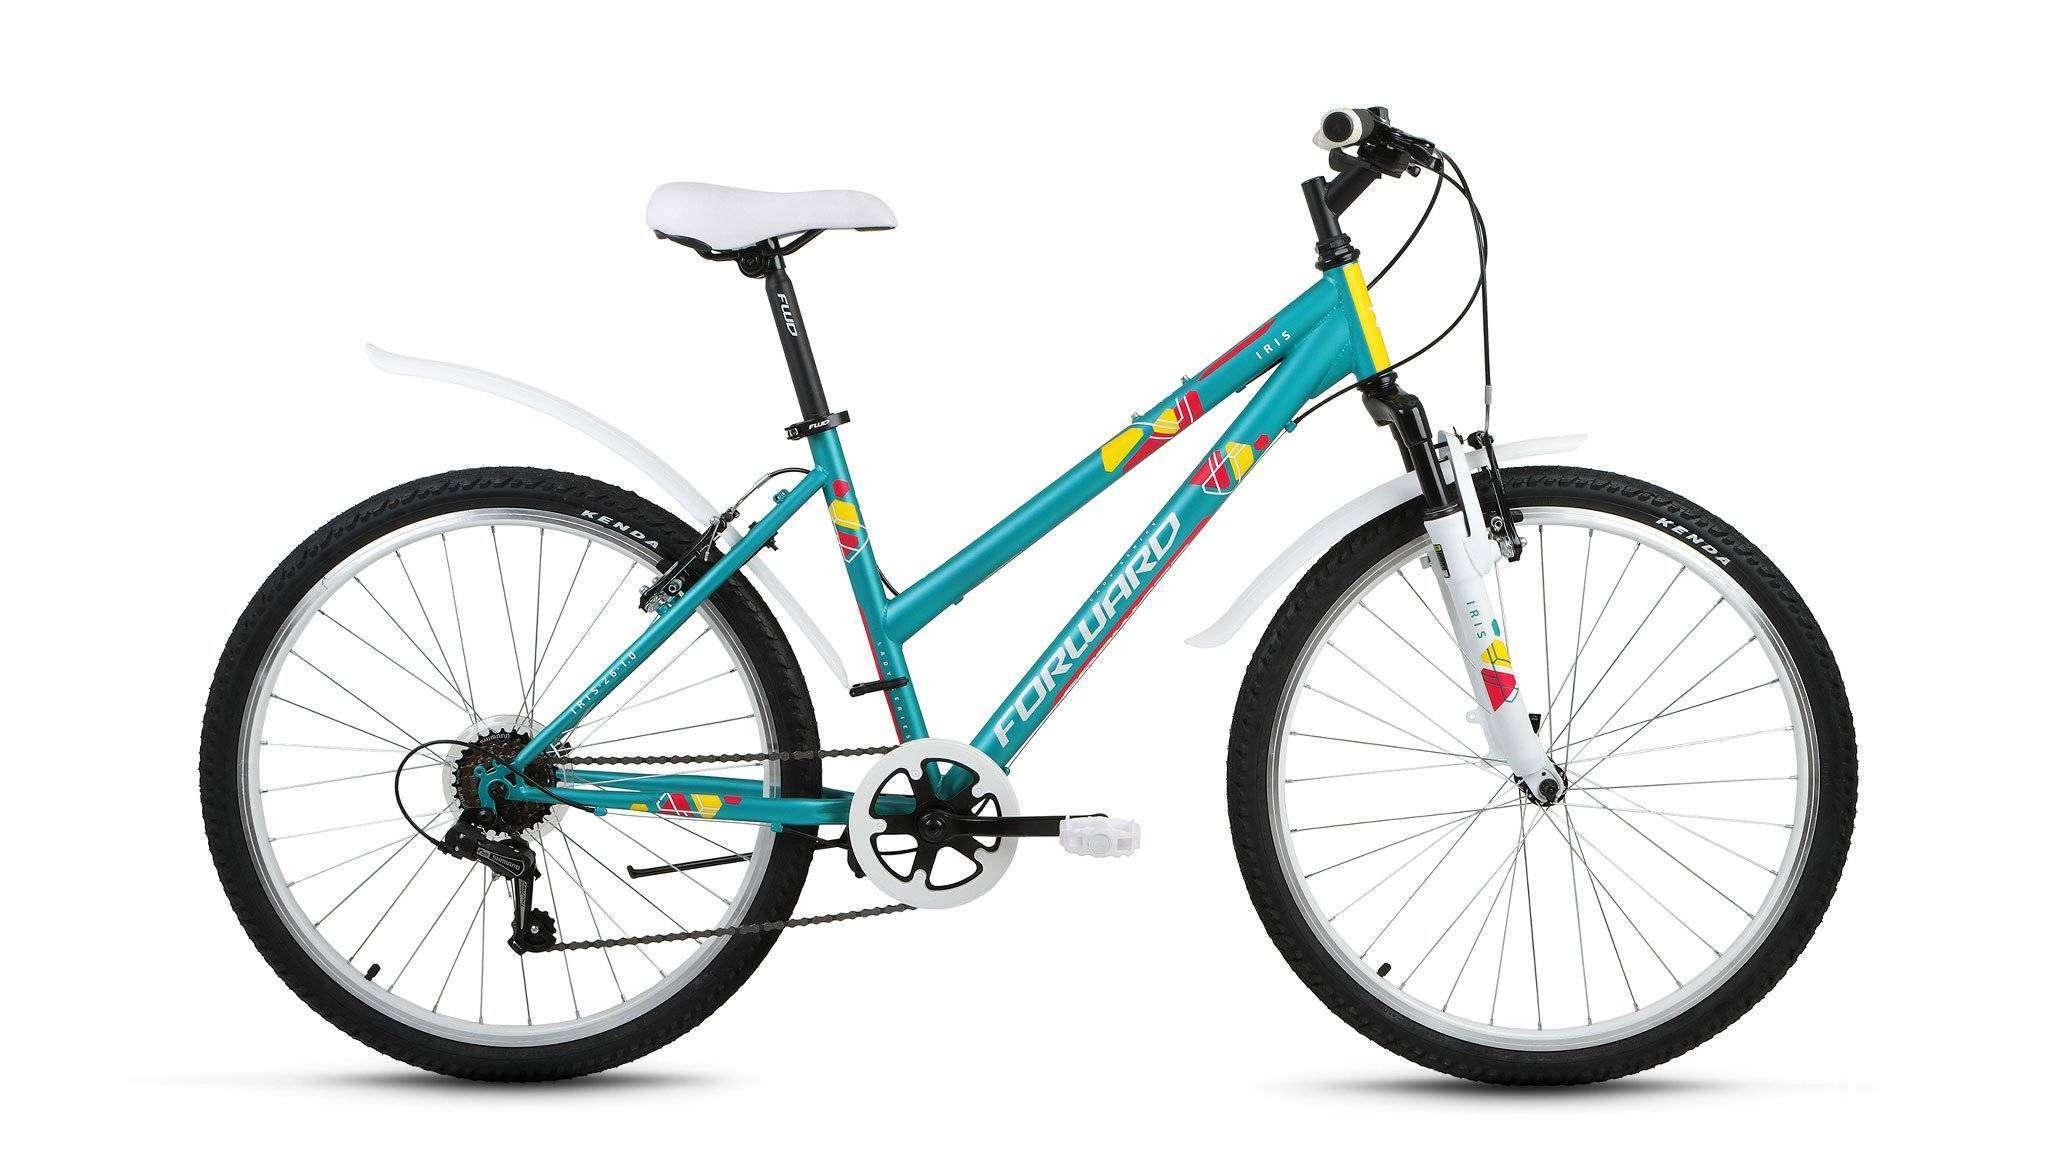 Велосипед FORWARD IRIS 26 1.0 2017-2018 36513